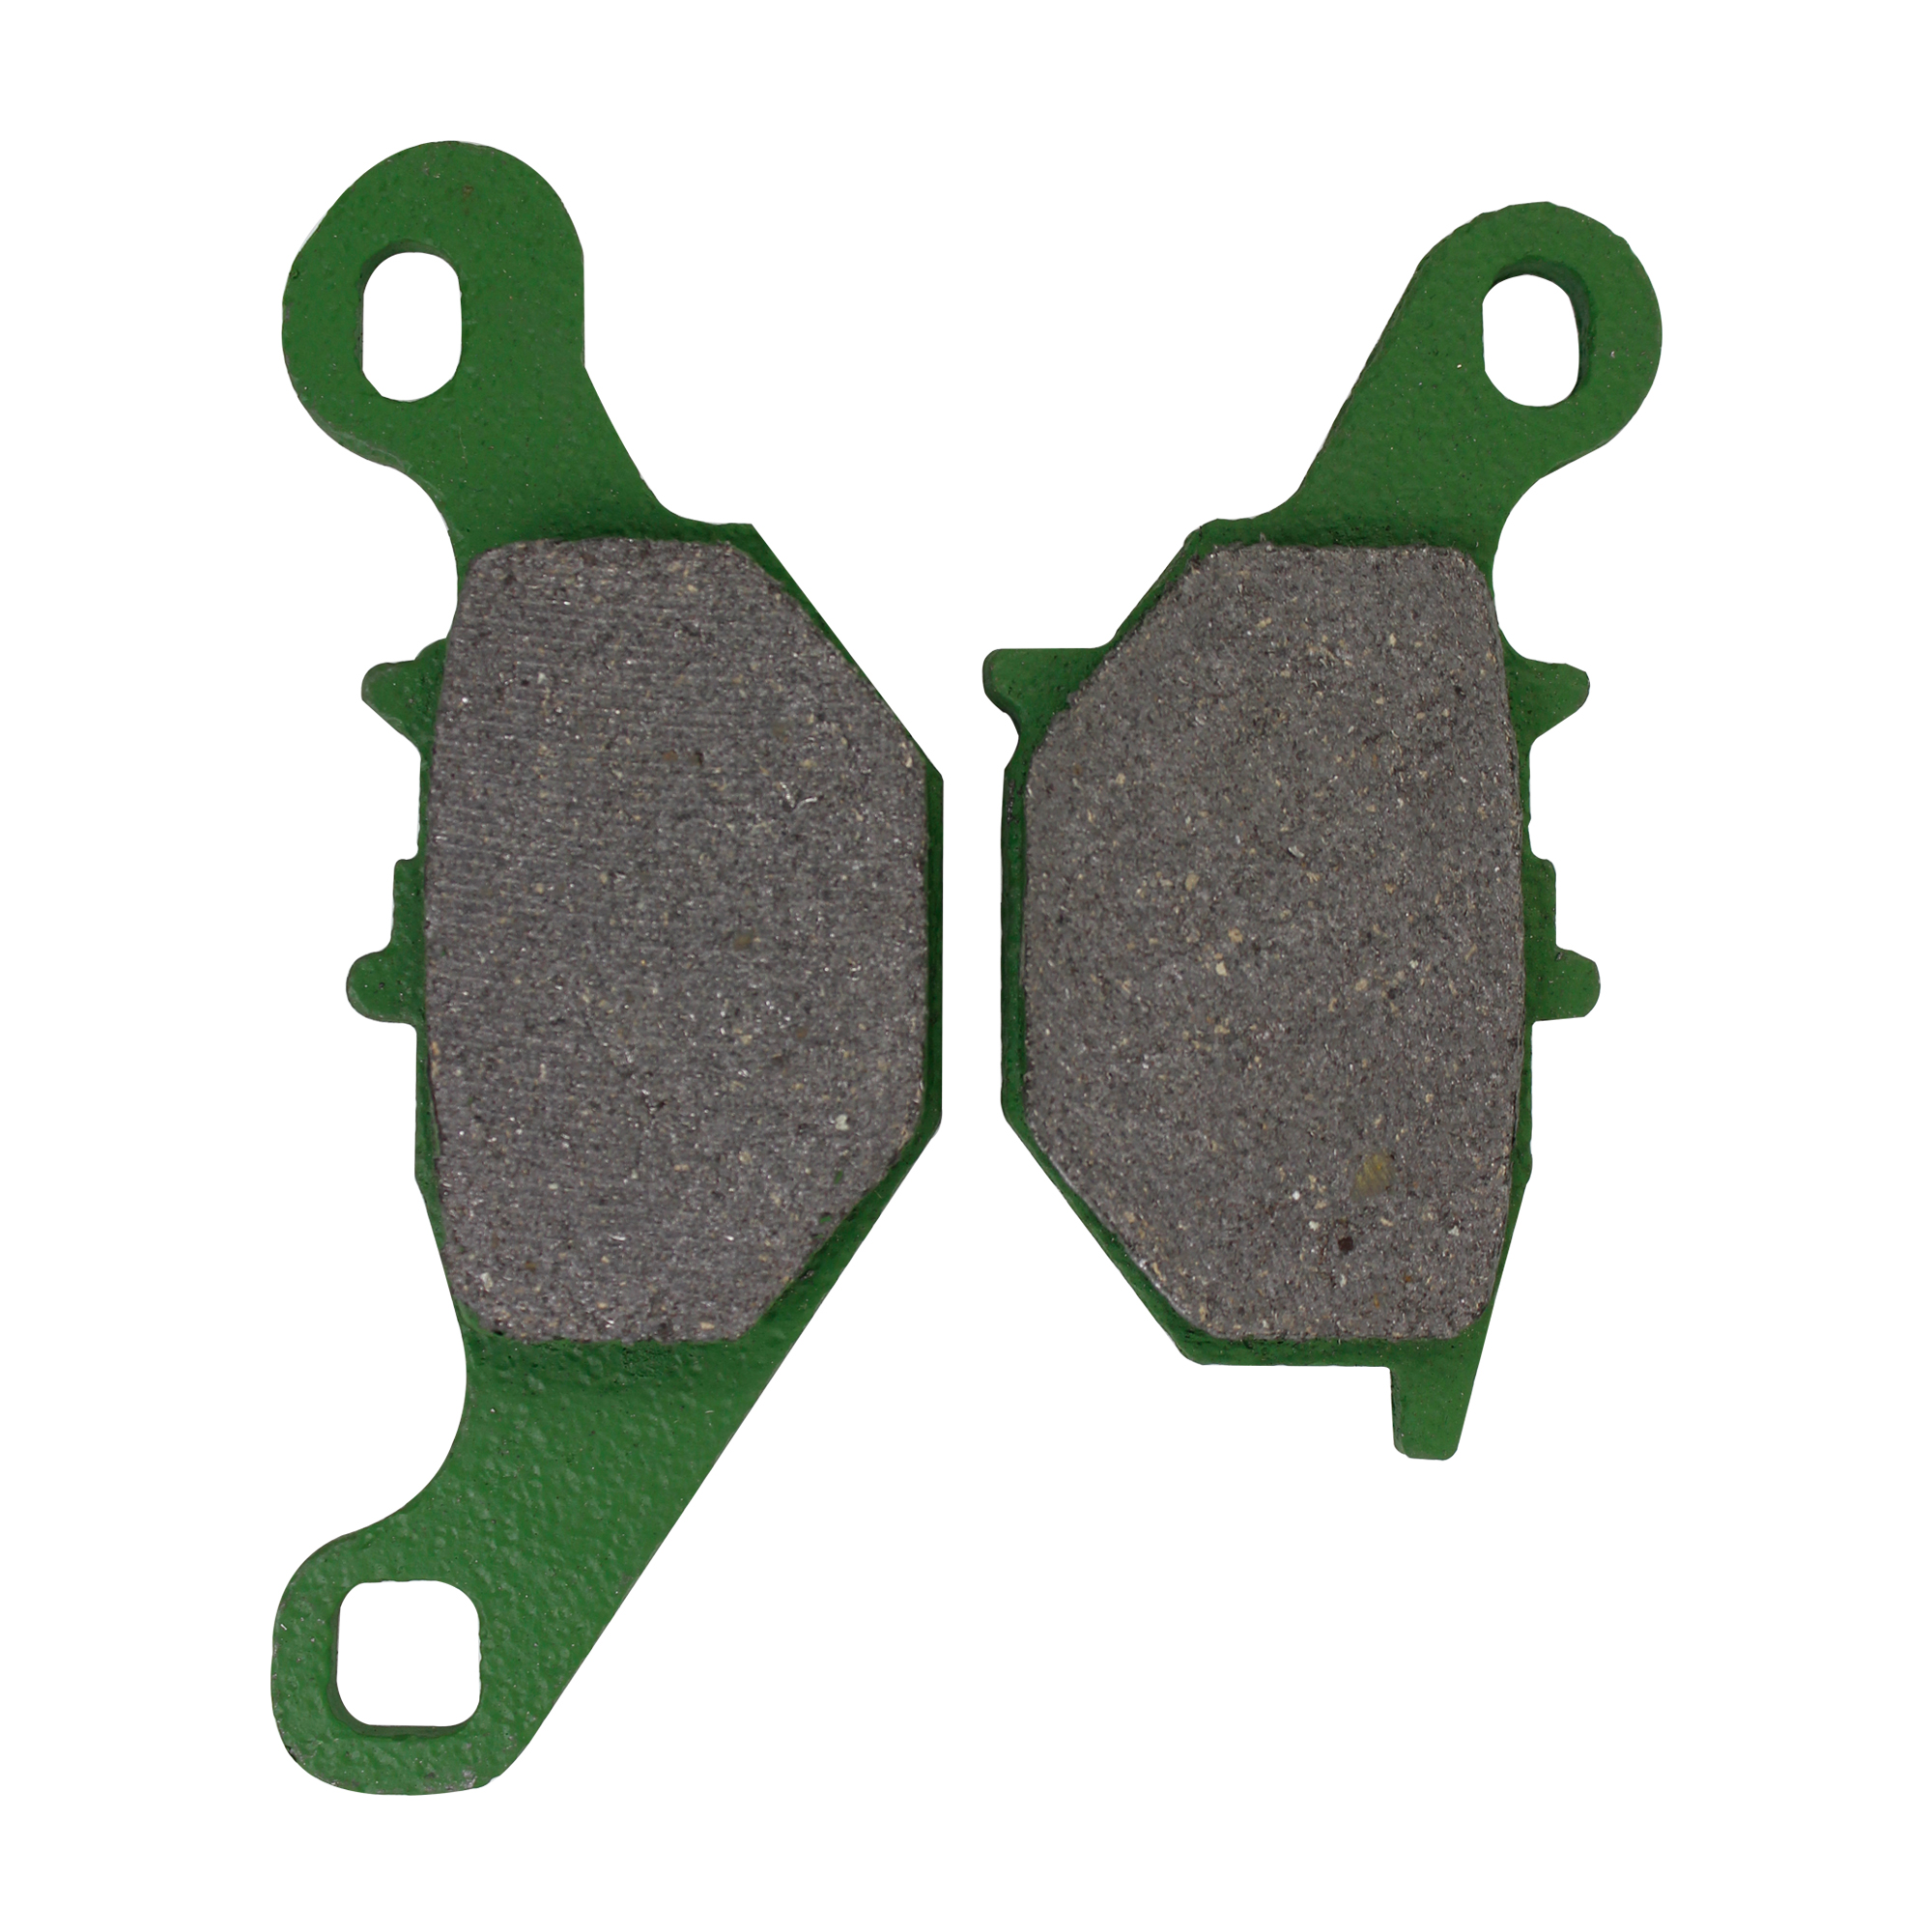 Armstrong GG Range Road Front Brake Pads - #230386